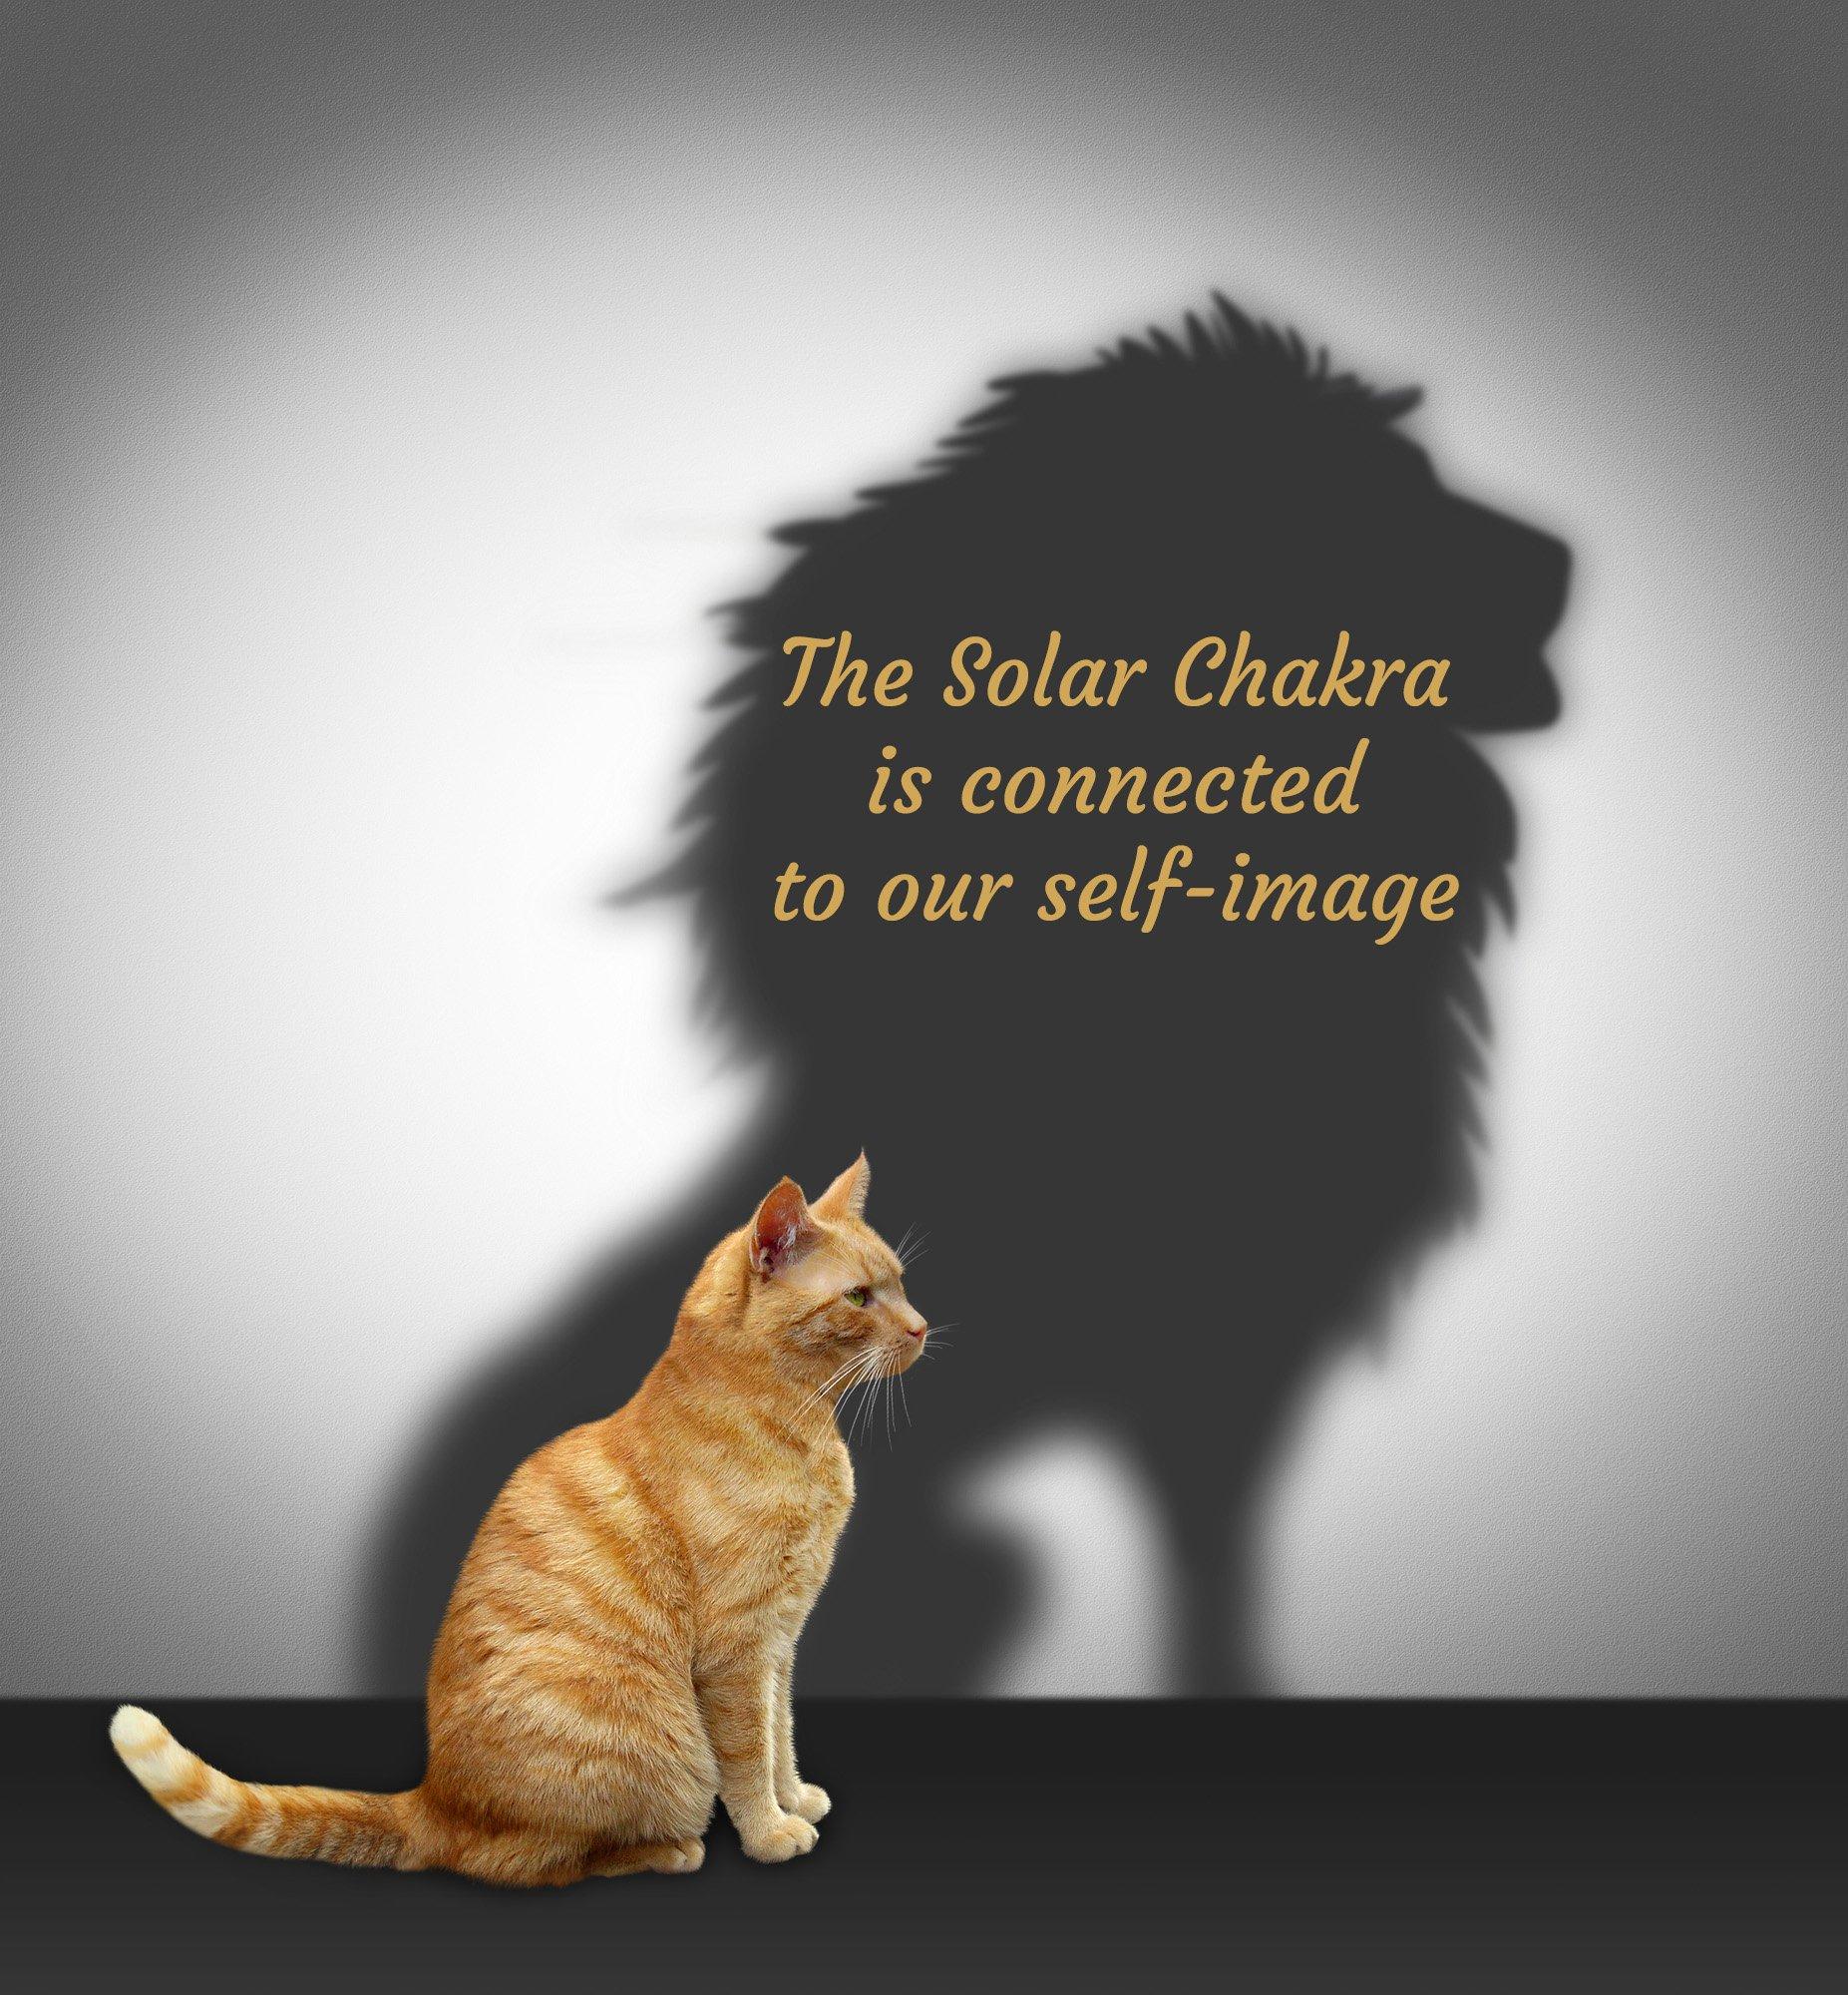 solar plexus chakra confidence boost from affirmation